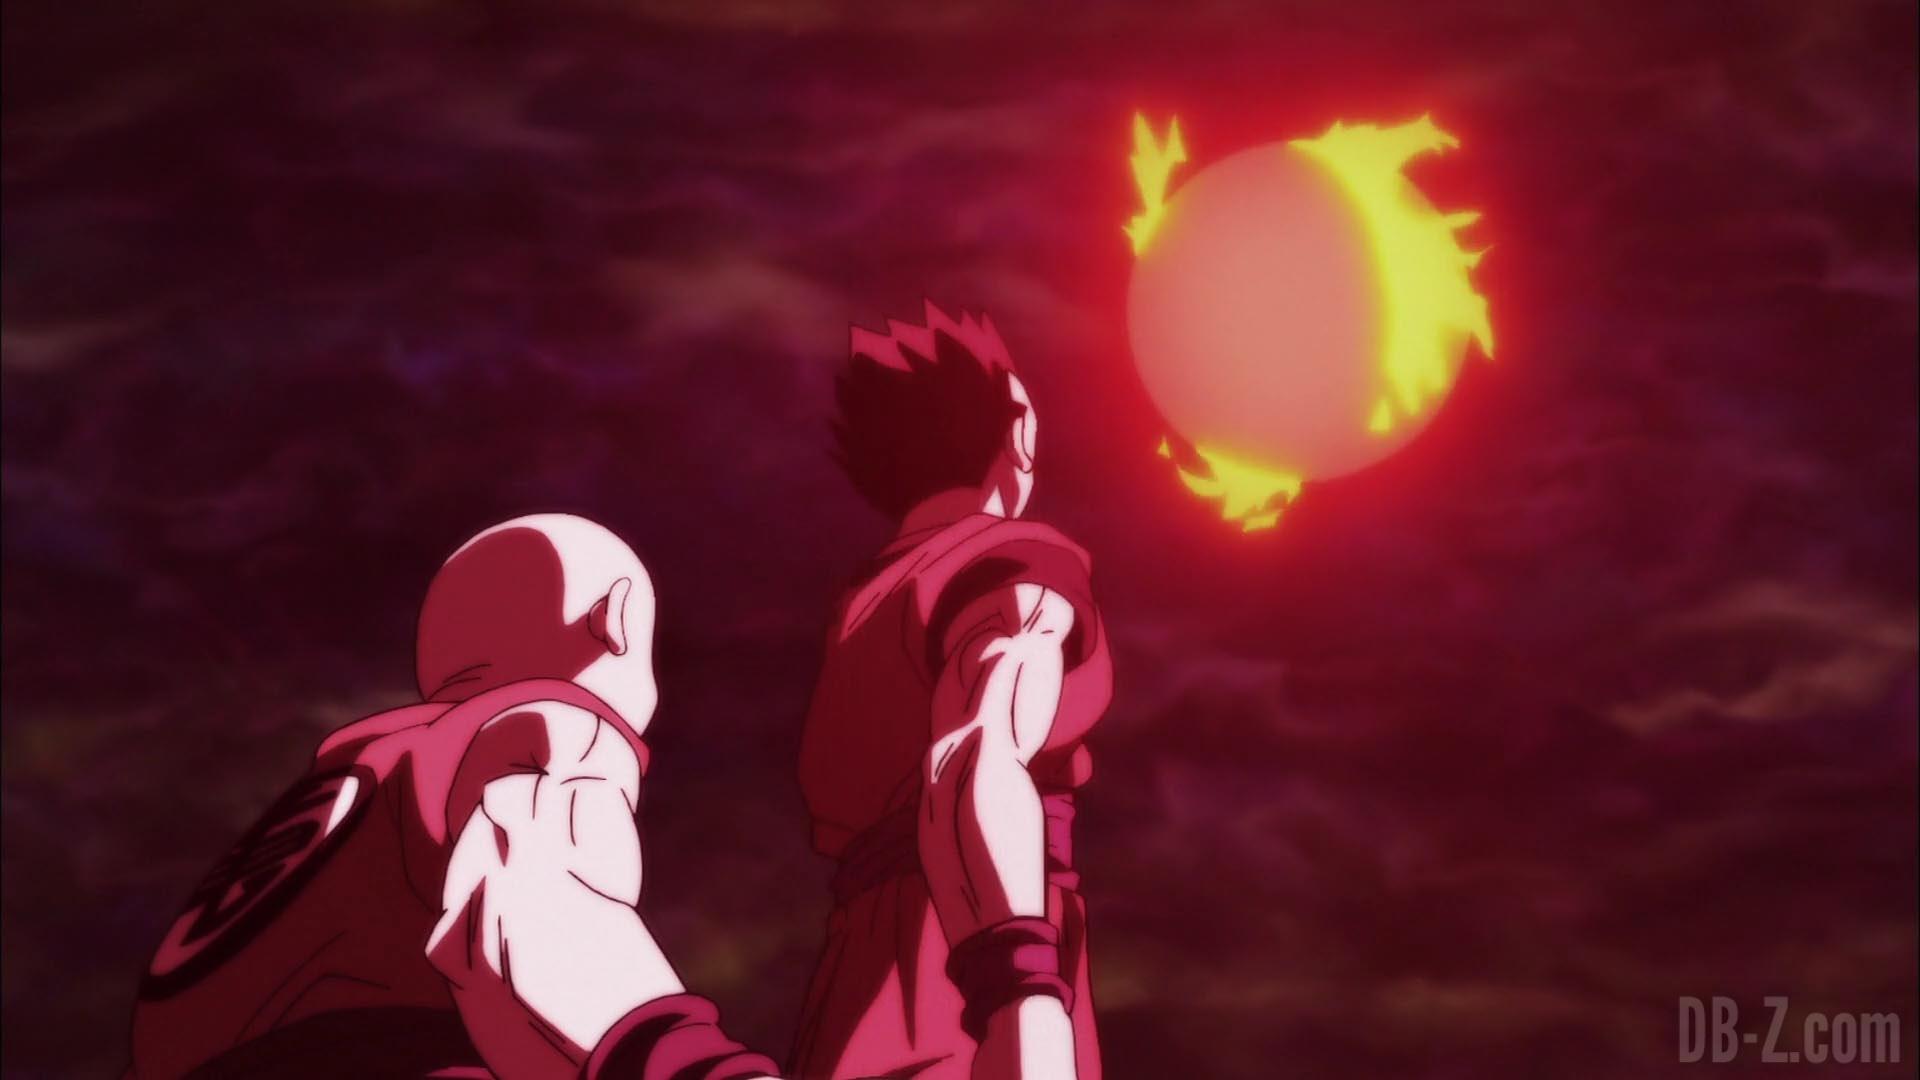 Dragon-Ball-Super-Episode-99-38-Krilin-G